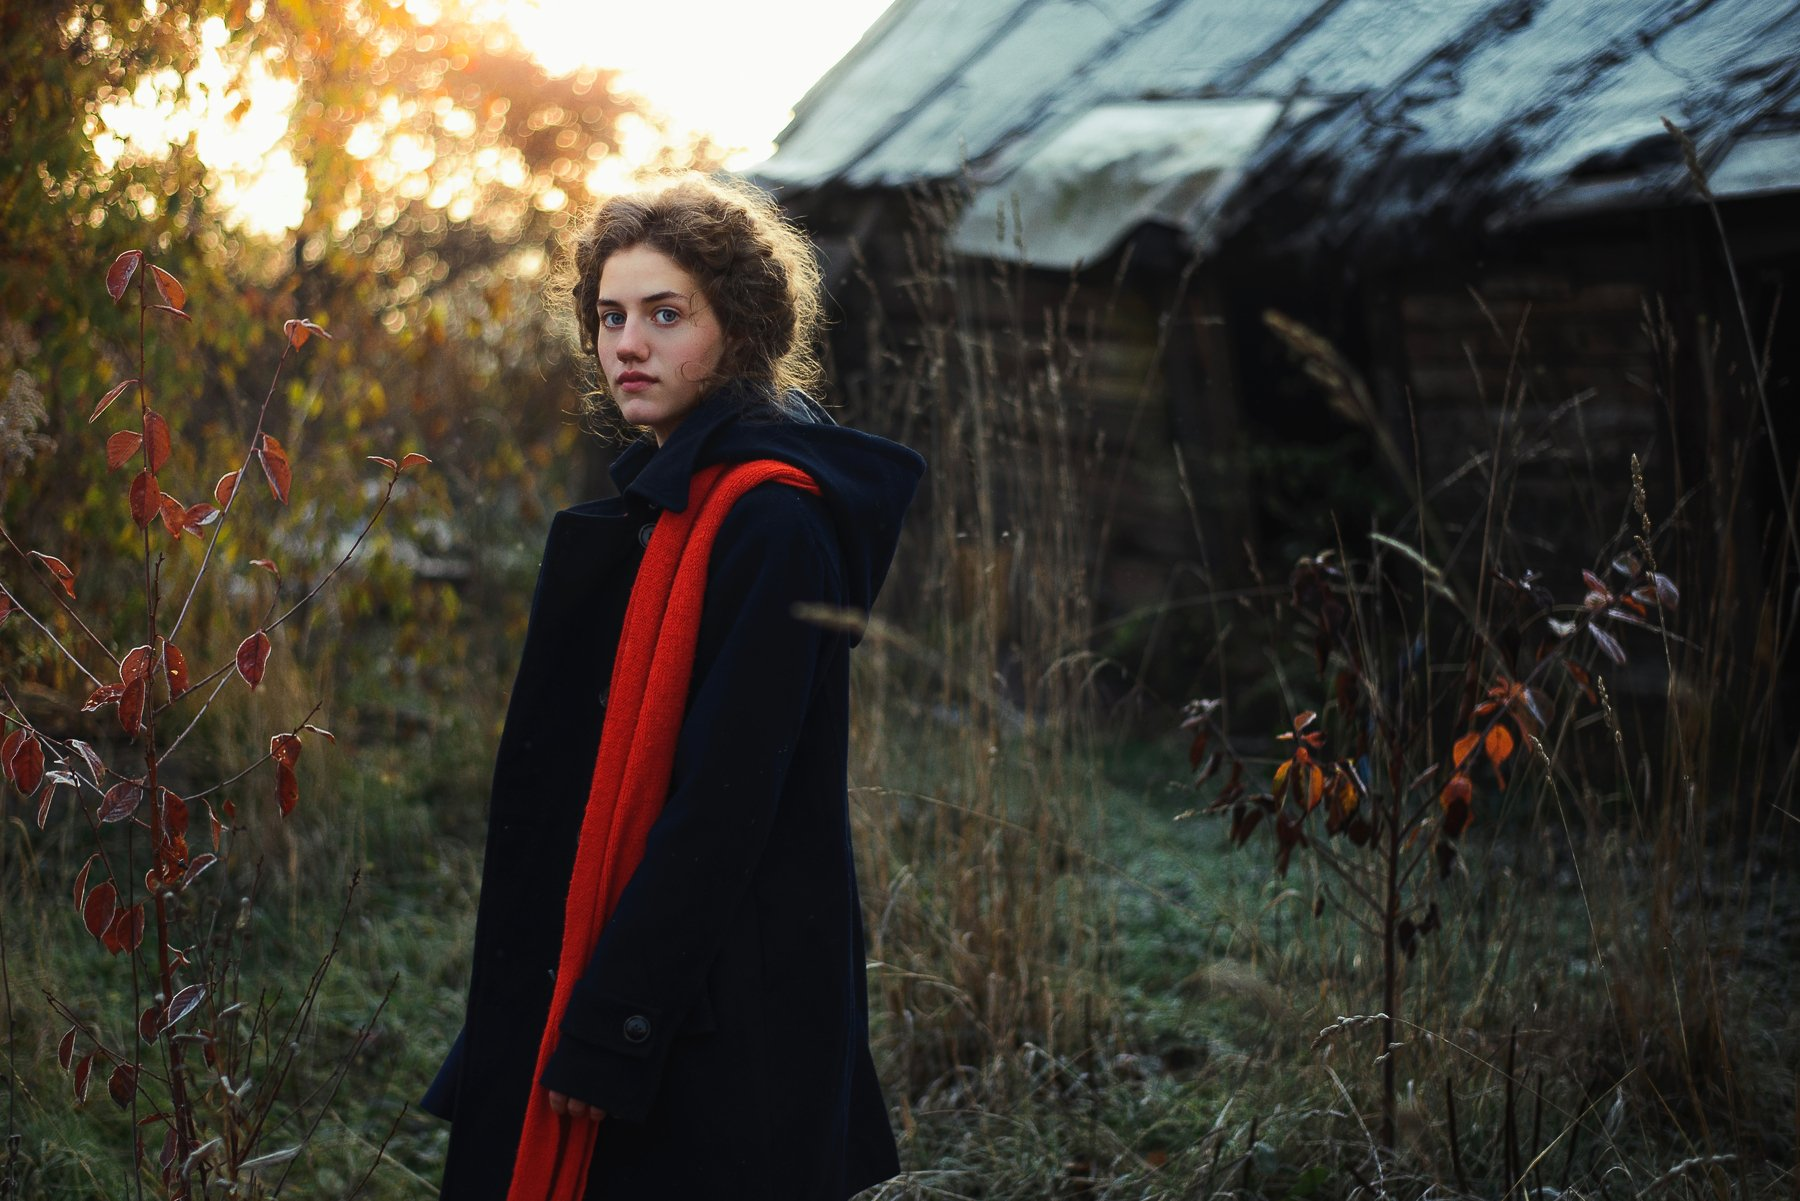 girl, portrair, катя, девушка, деревня, дом, портрет, шарф, Лена Коровашкина